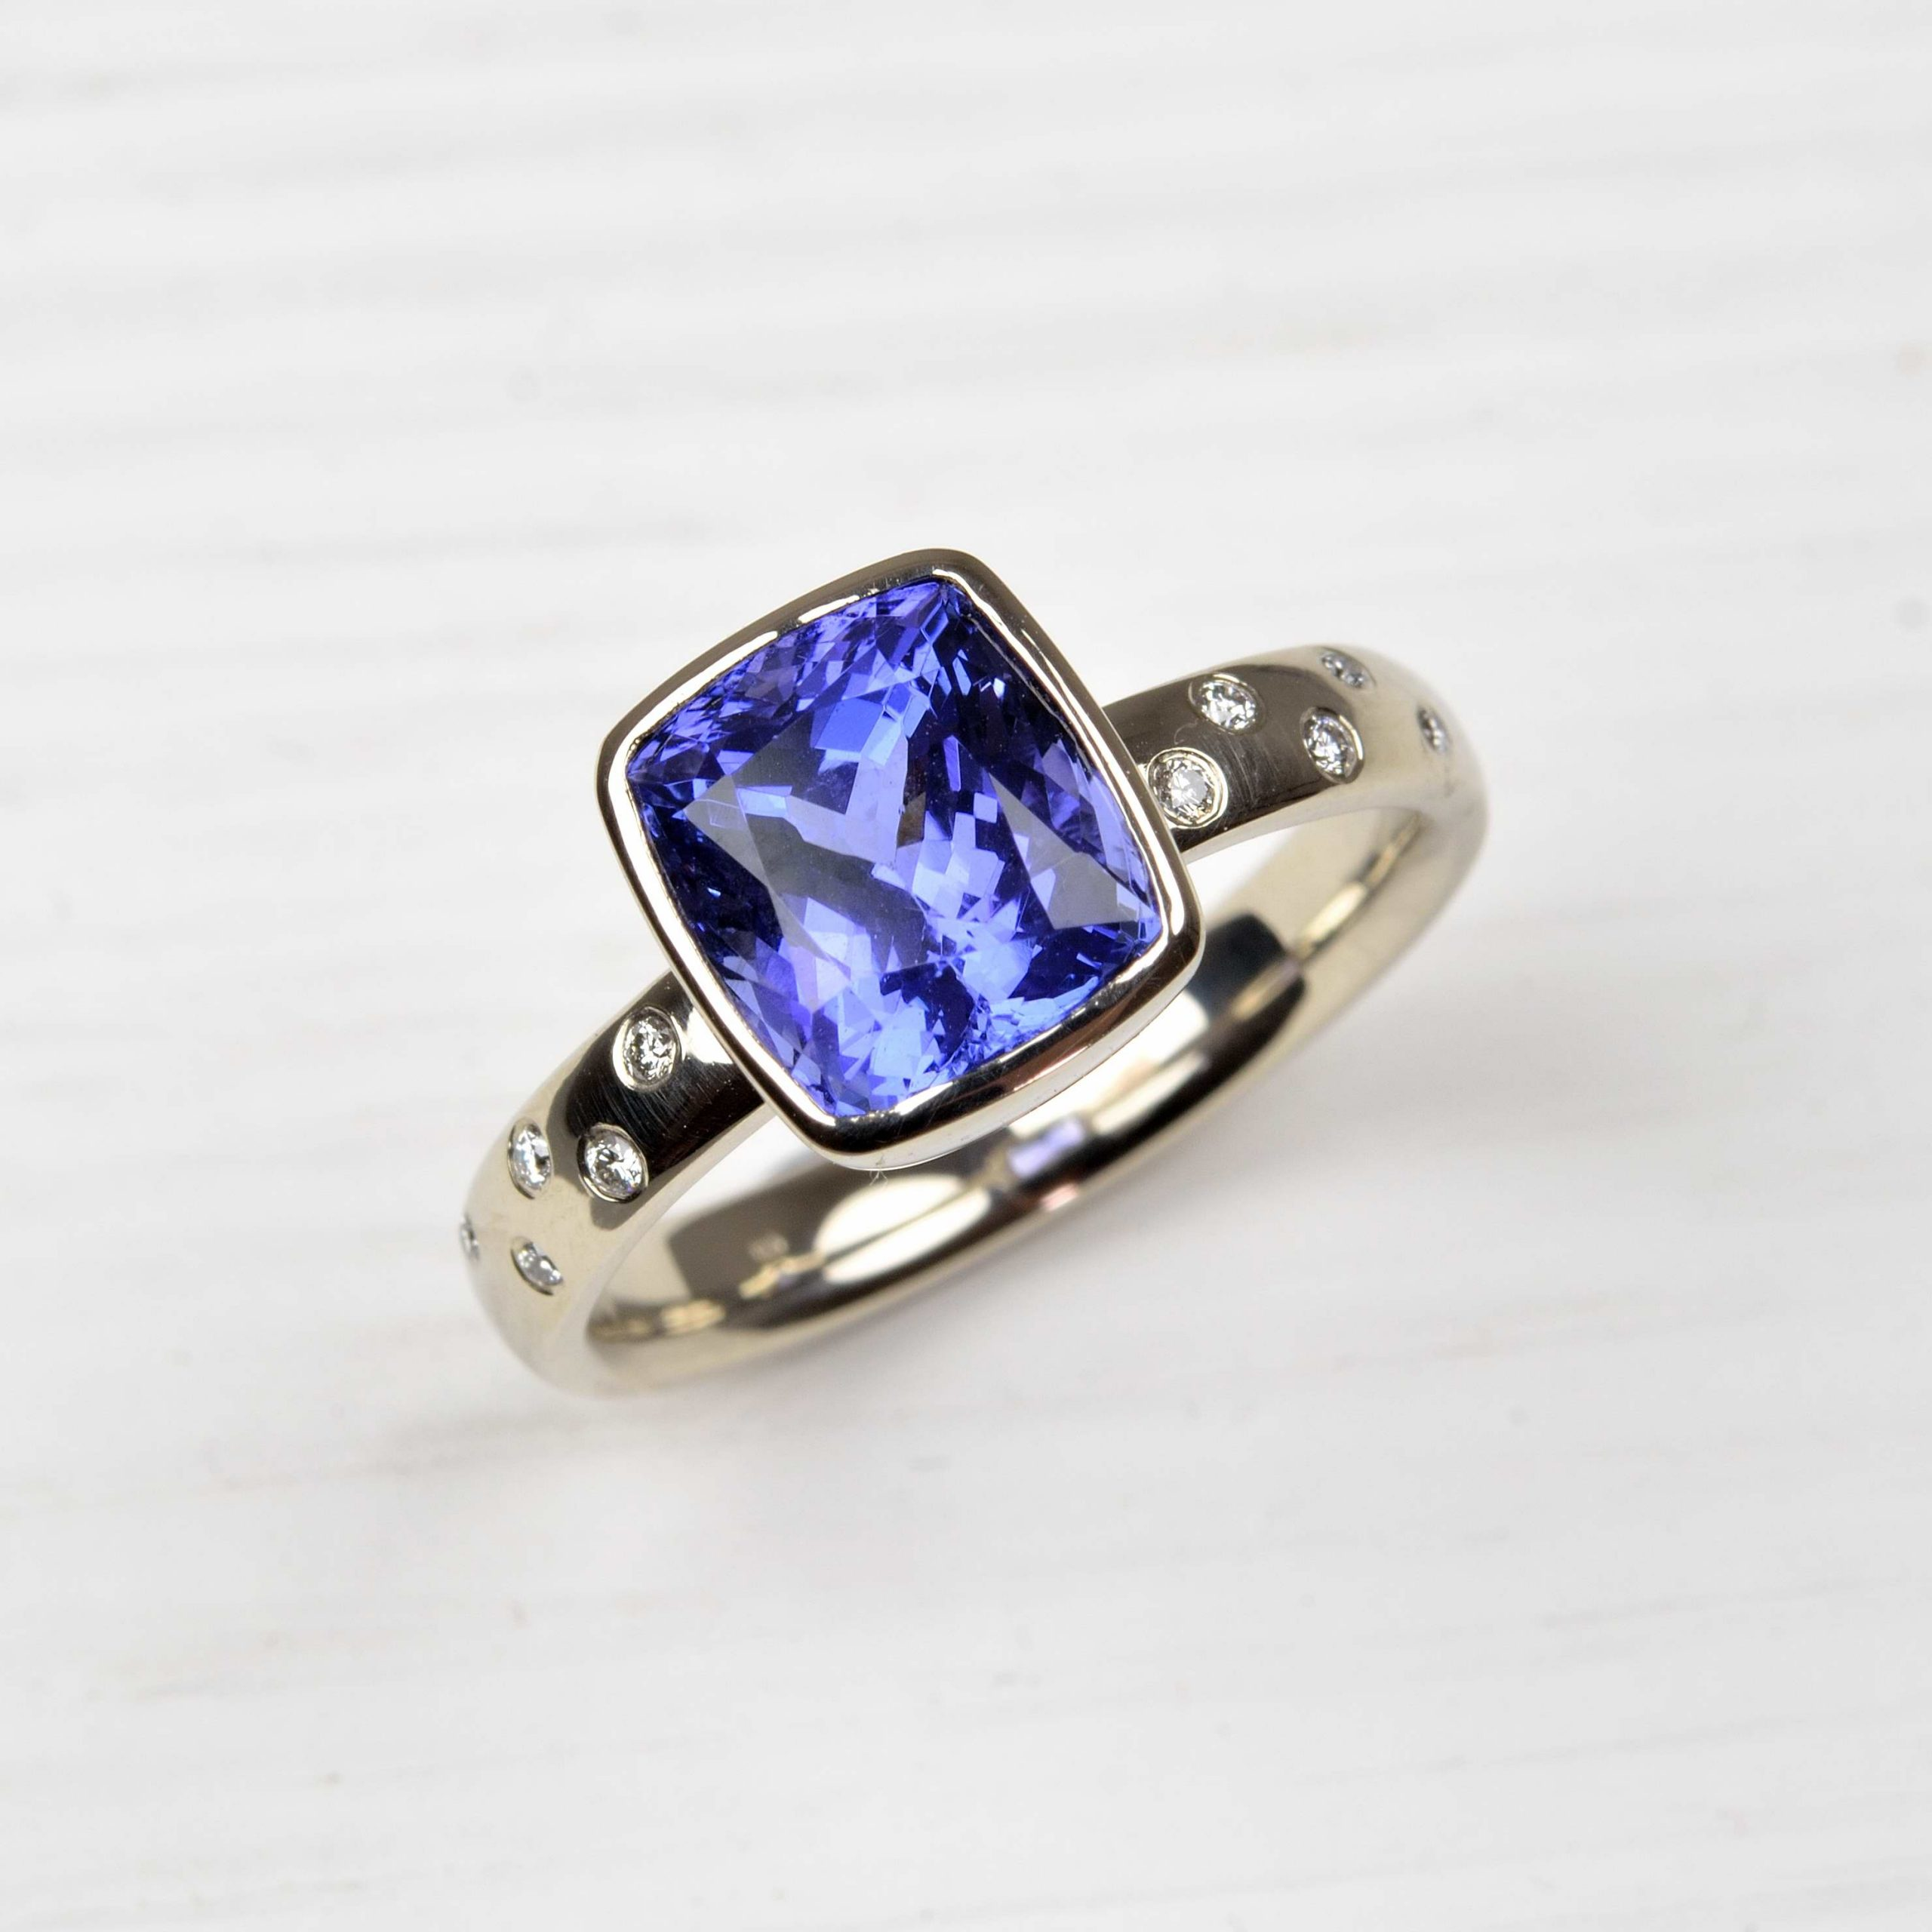 18ct white gold ring with tanzanite and diamonds